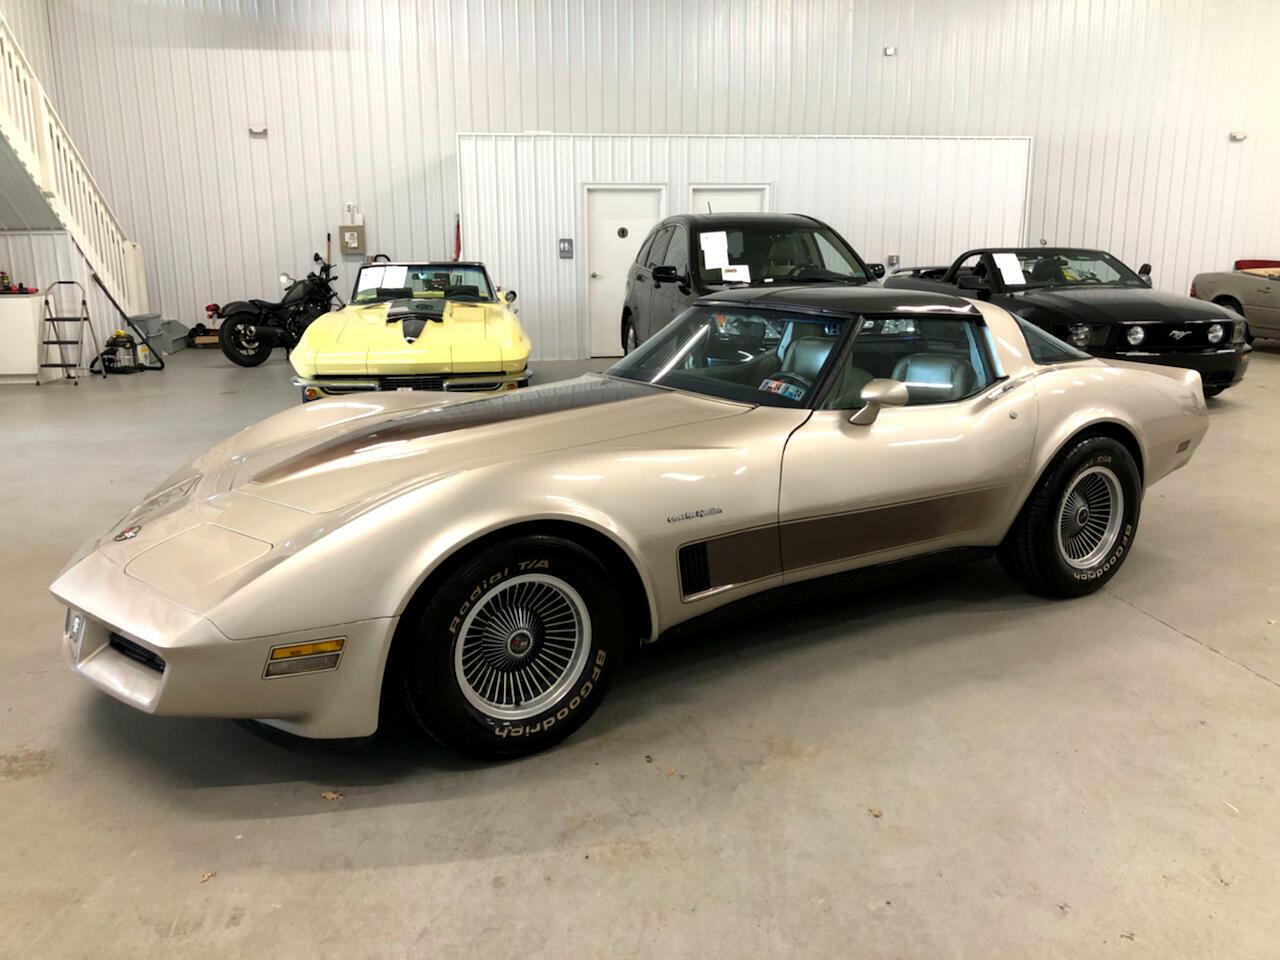 1982 Silver Chevrolet Corvette     C3 Corvette Photo 1